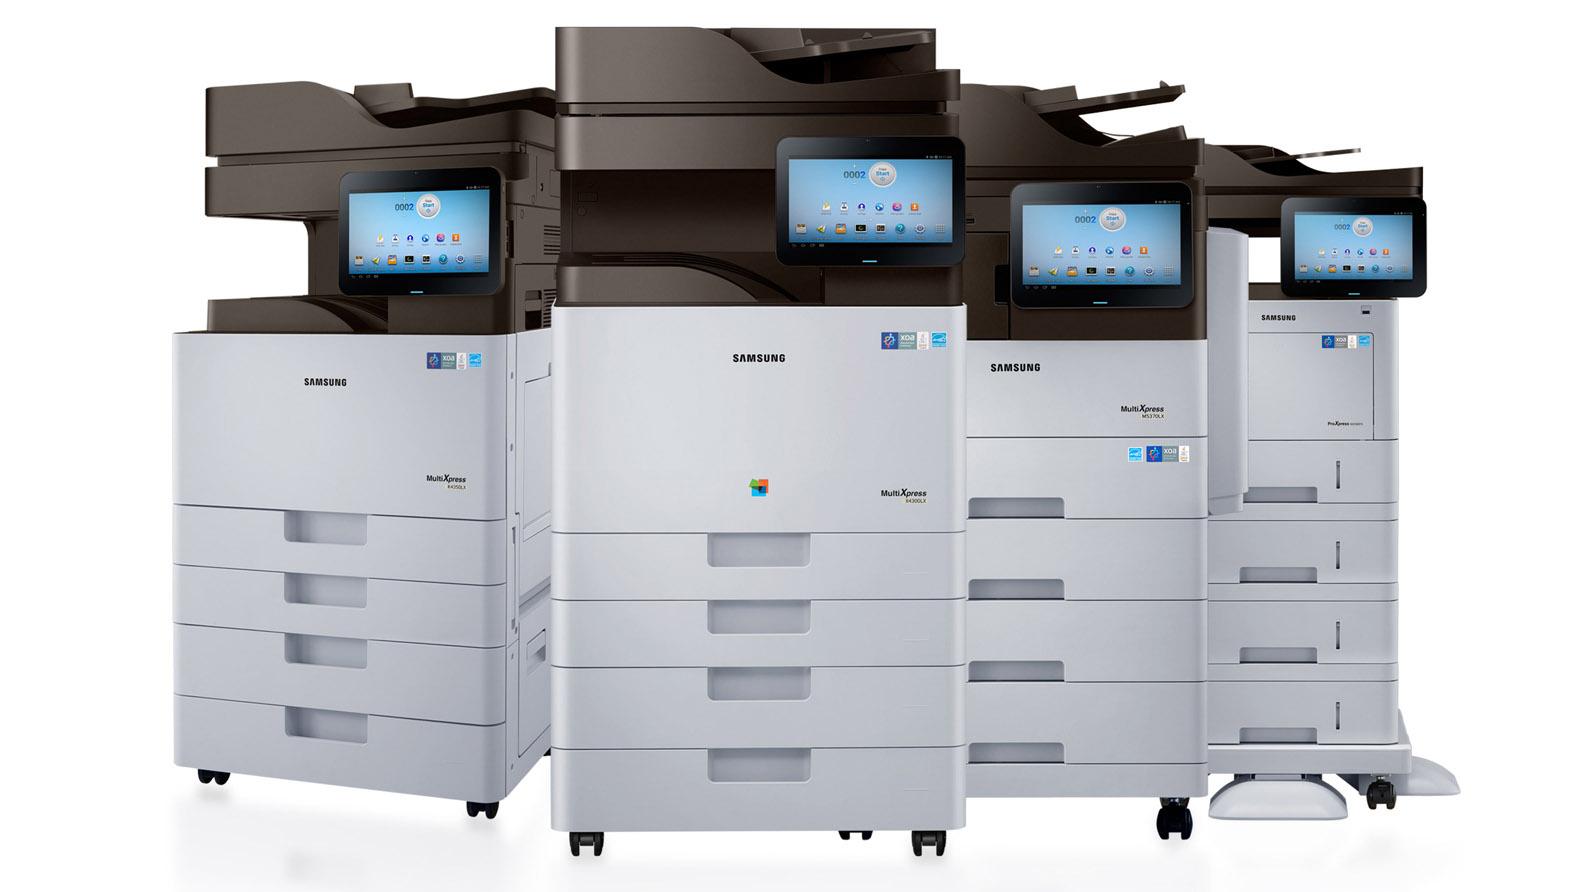 Giannone Computers, Multifunzioni e Stampanti, Samsung Hp, Stampanti per ufficio